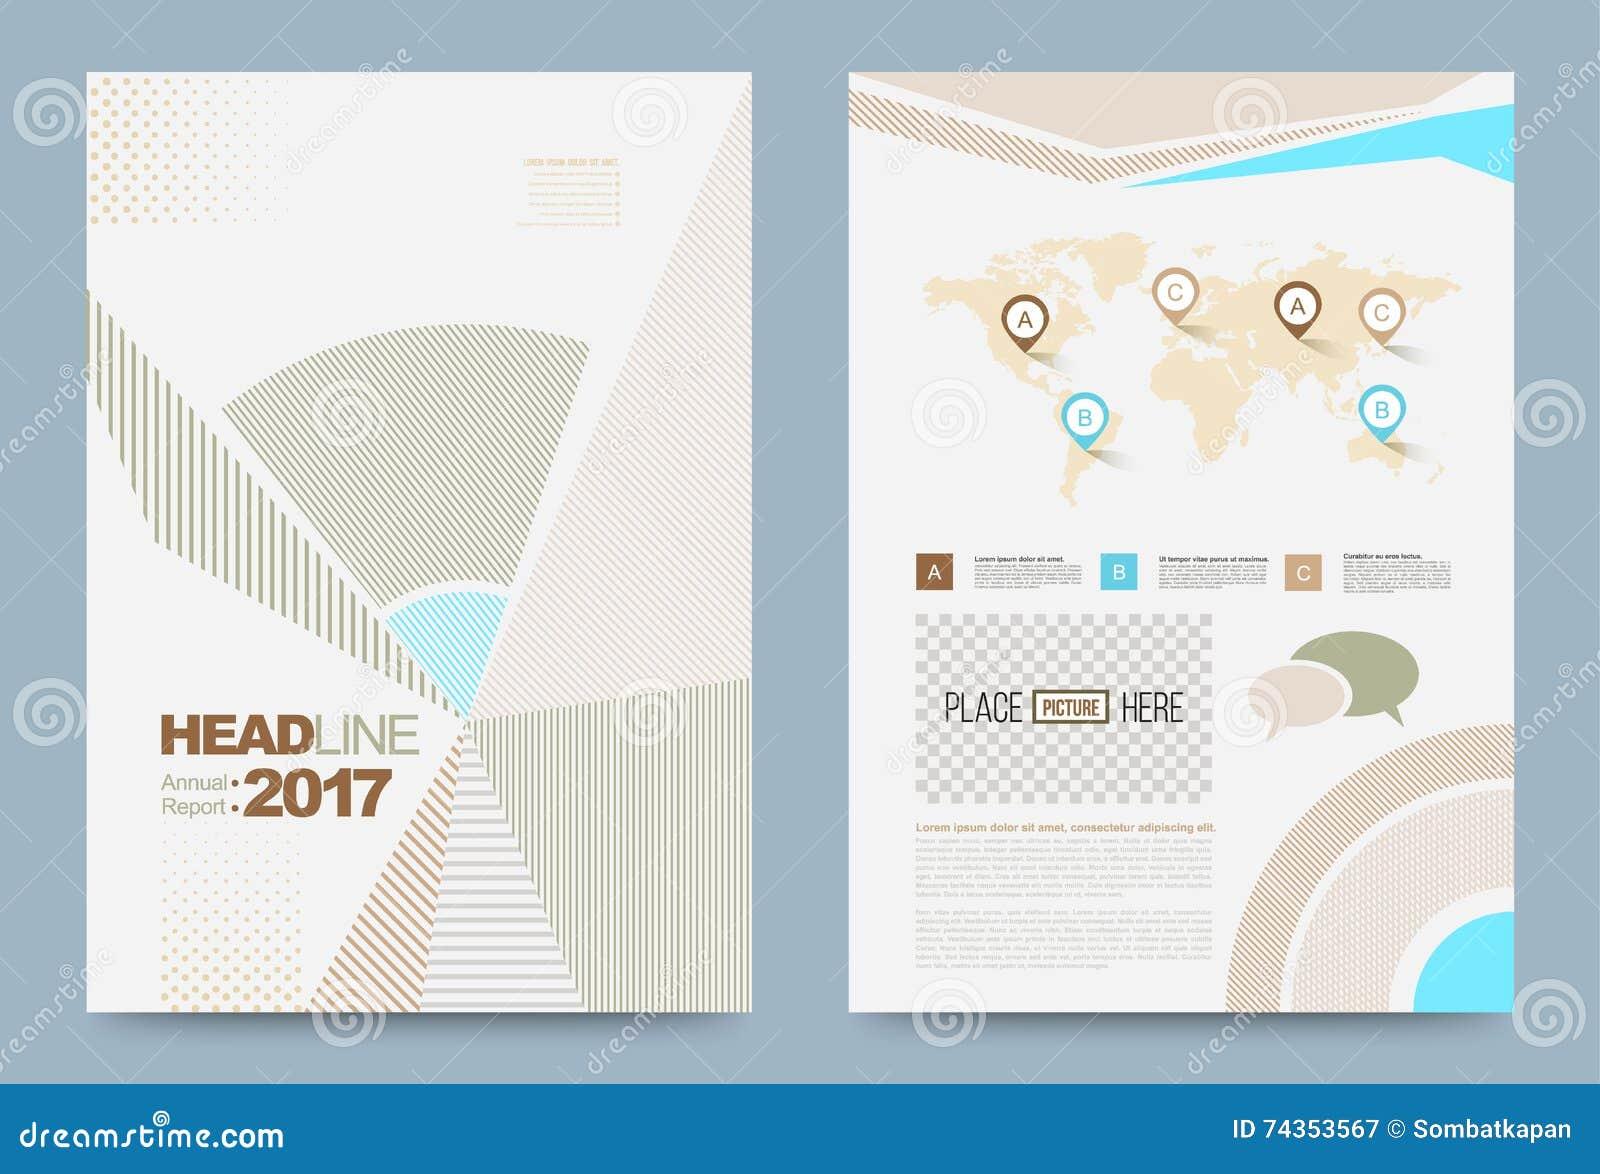 printing press brochure template - template design stock vector image 74353567